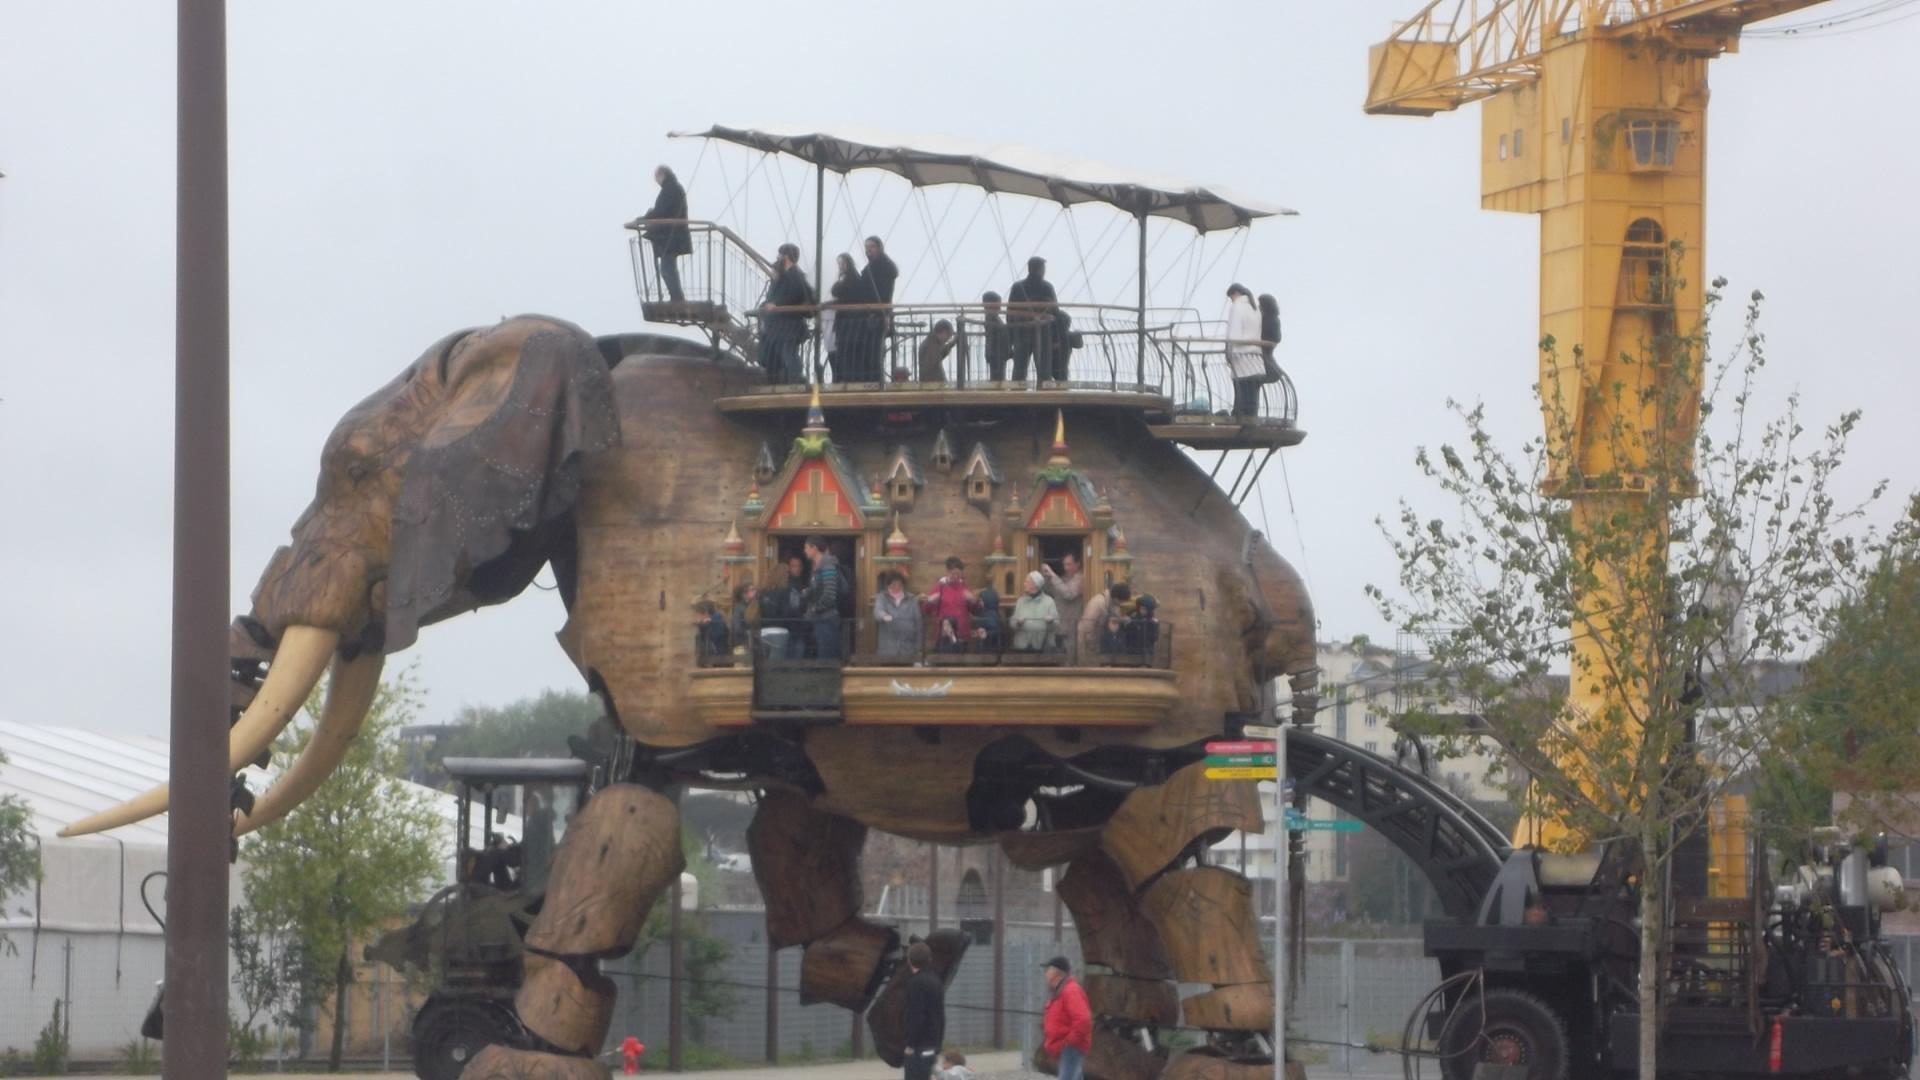 nantes-galeries-des-machines-le-grand-elephant-side-my13